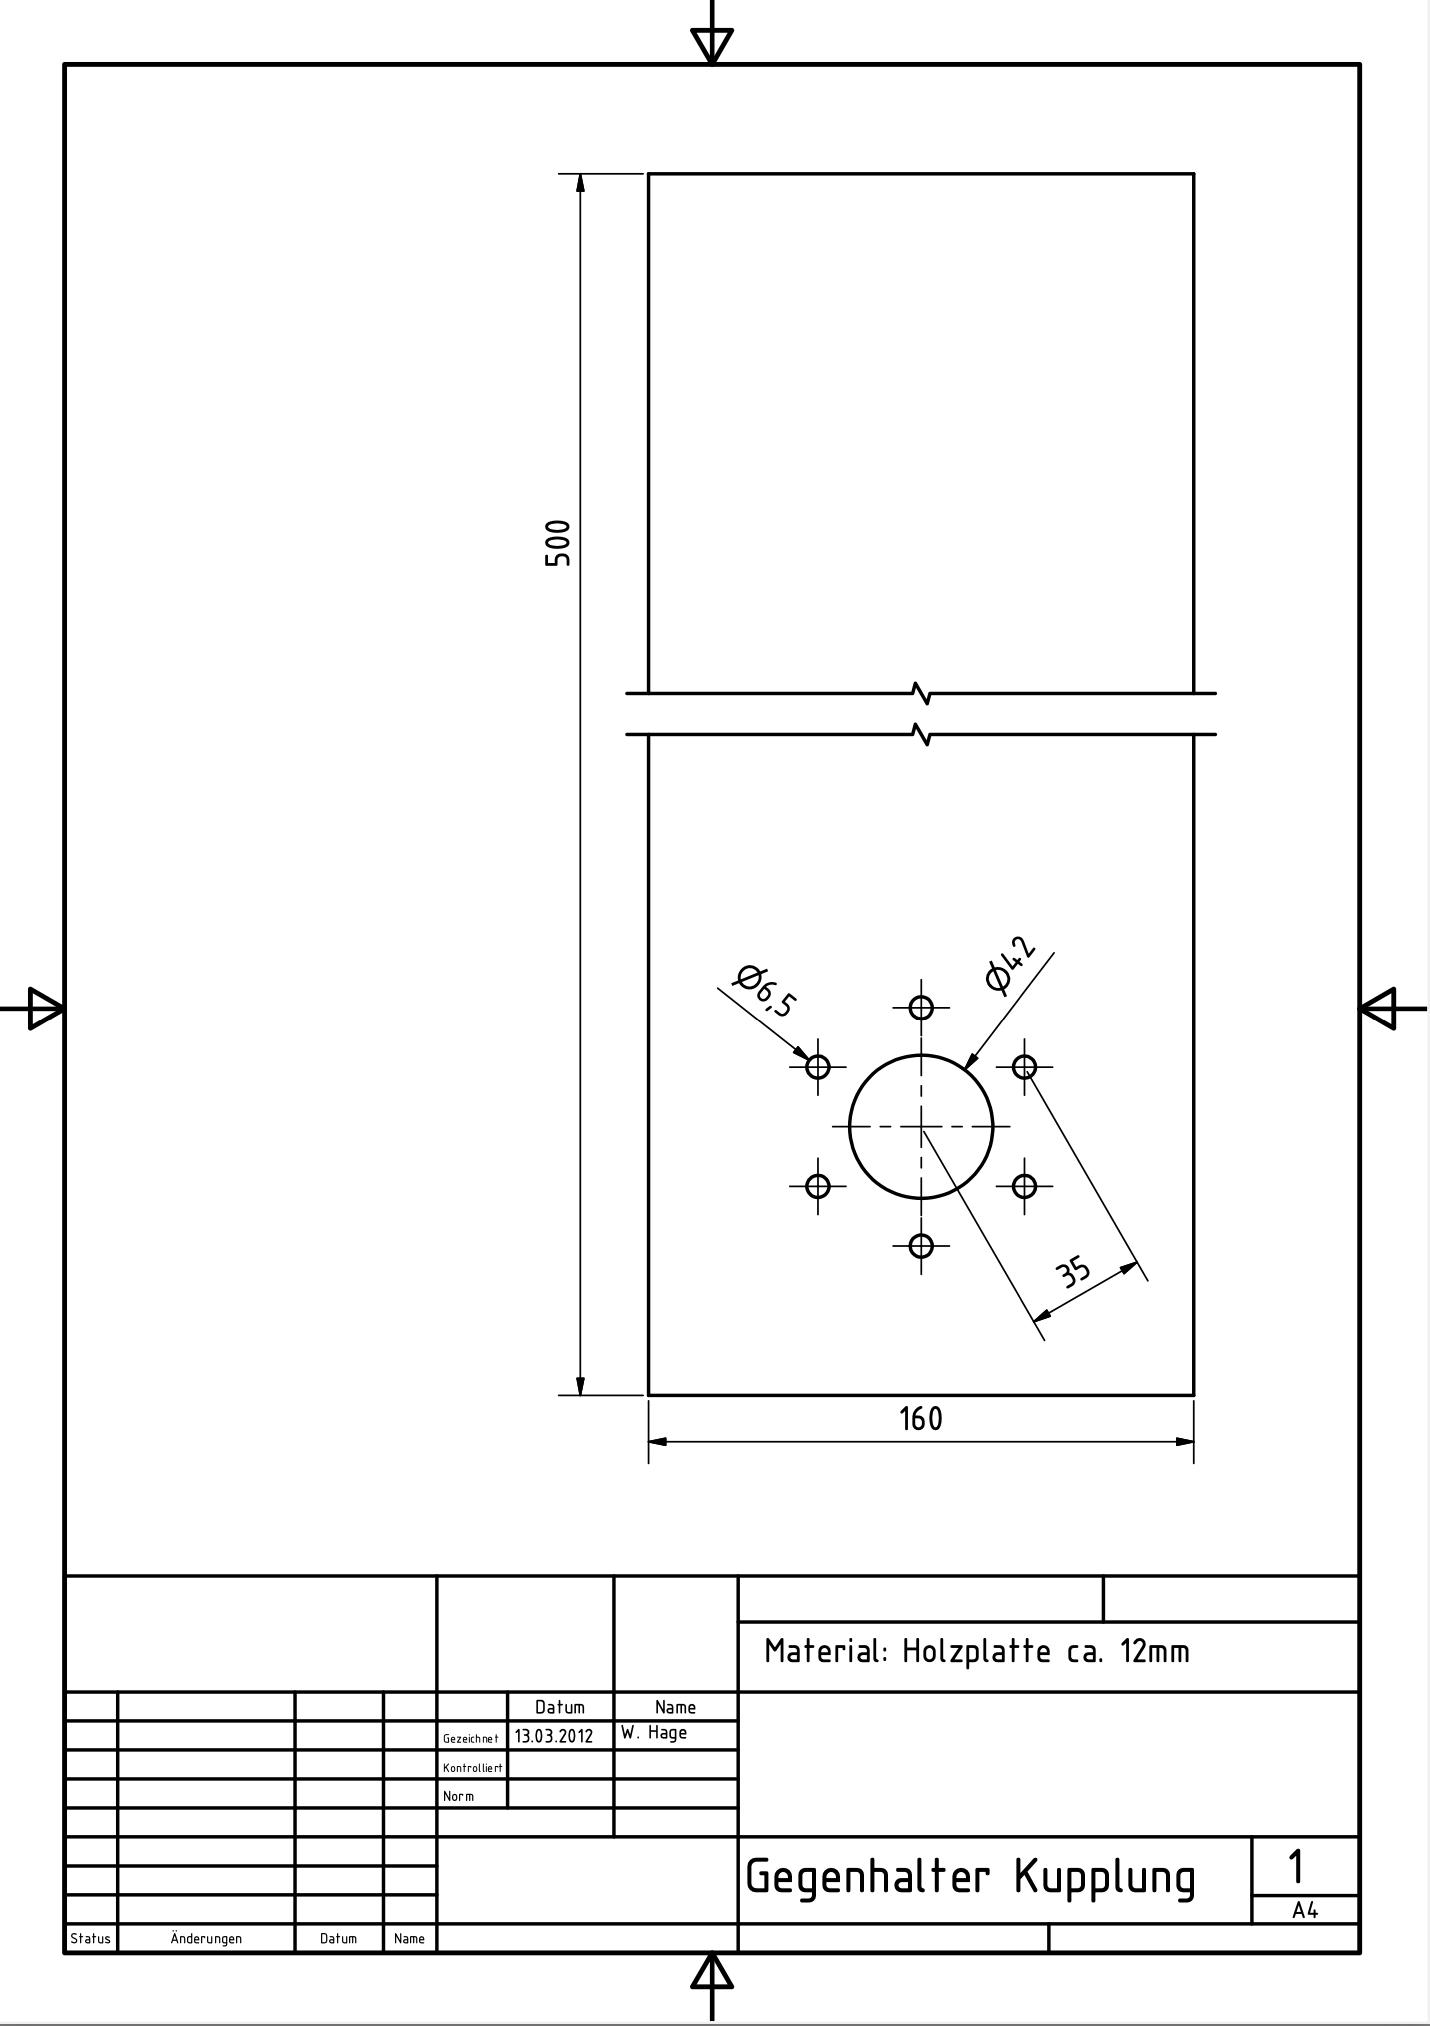 Gegenhalter-Kupplung-Pantah